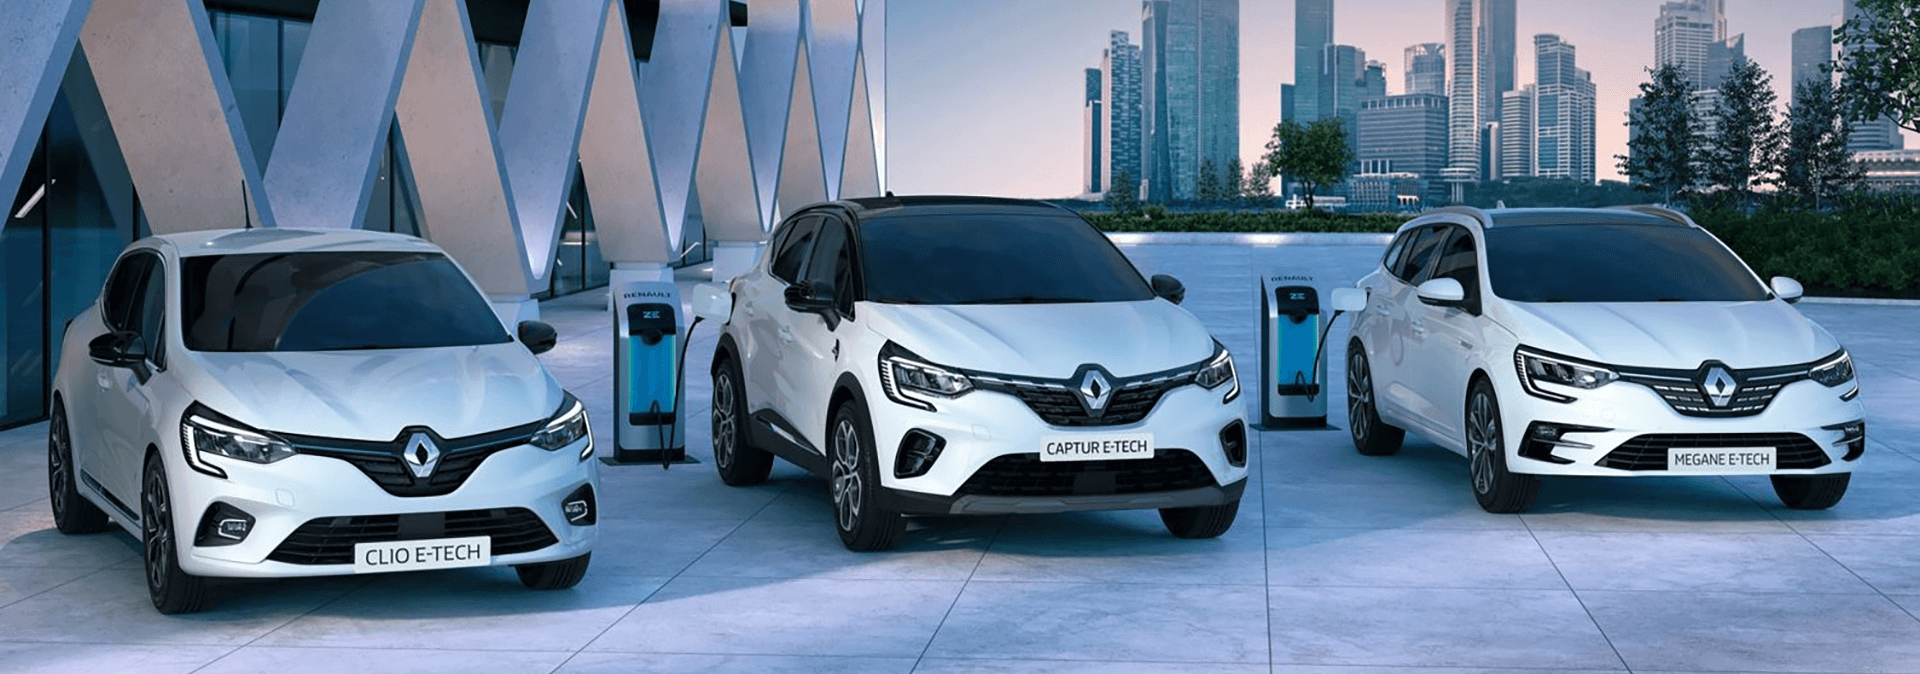 Used Renault car image